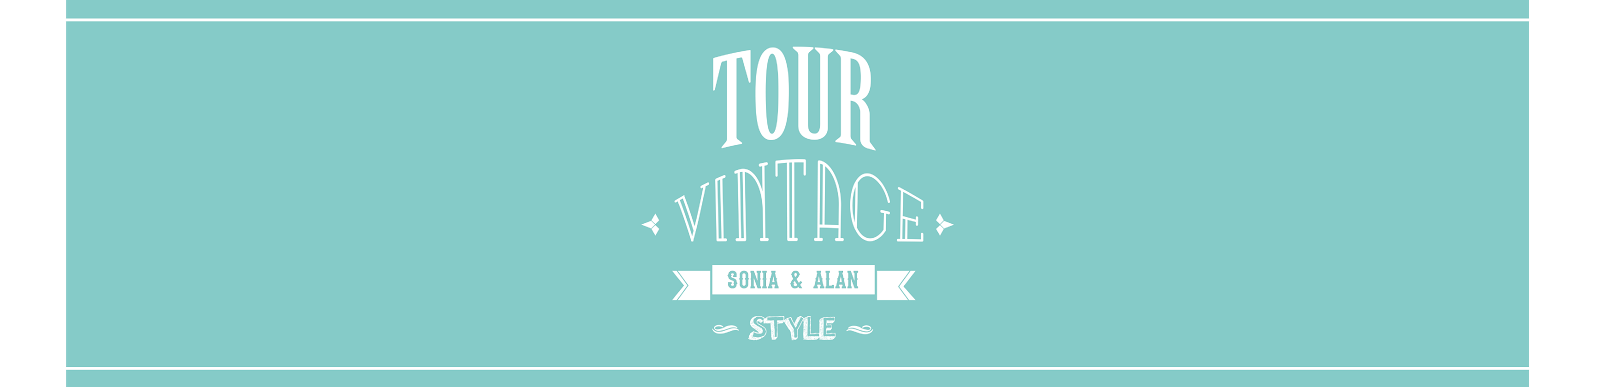 Tour Vintage